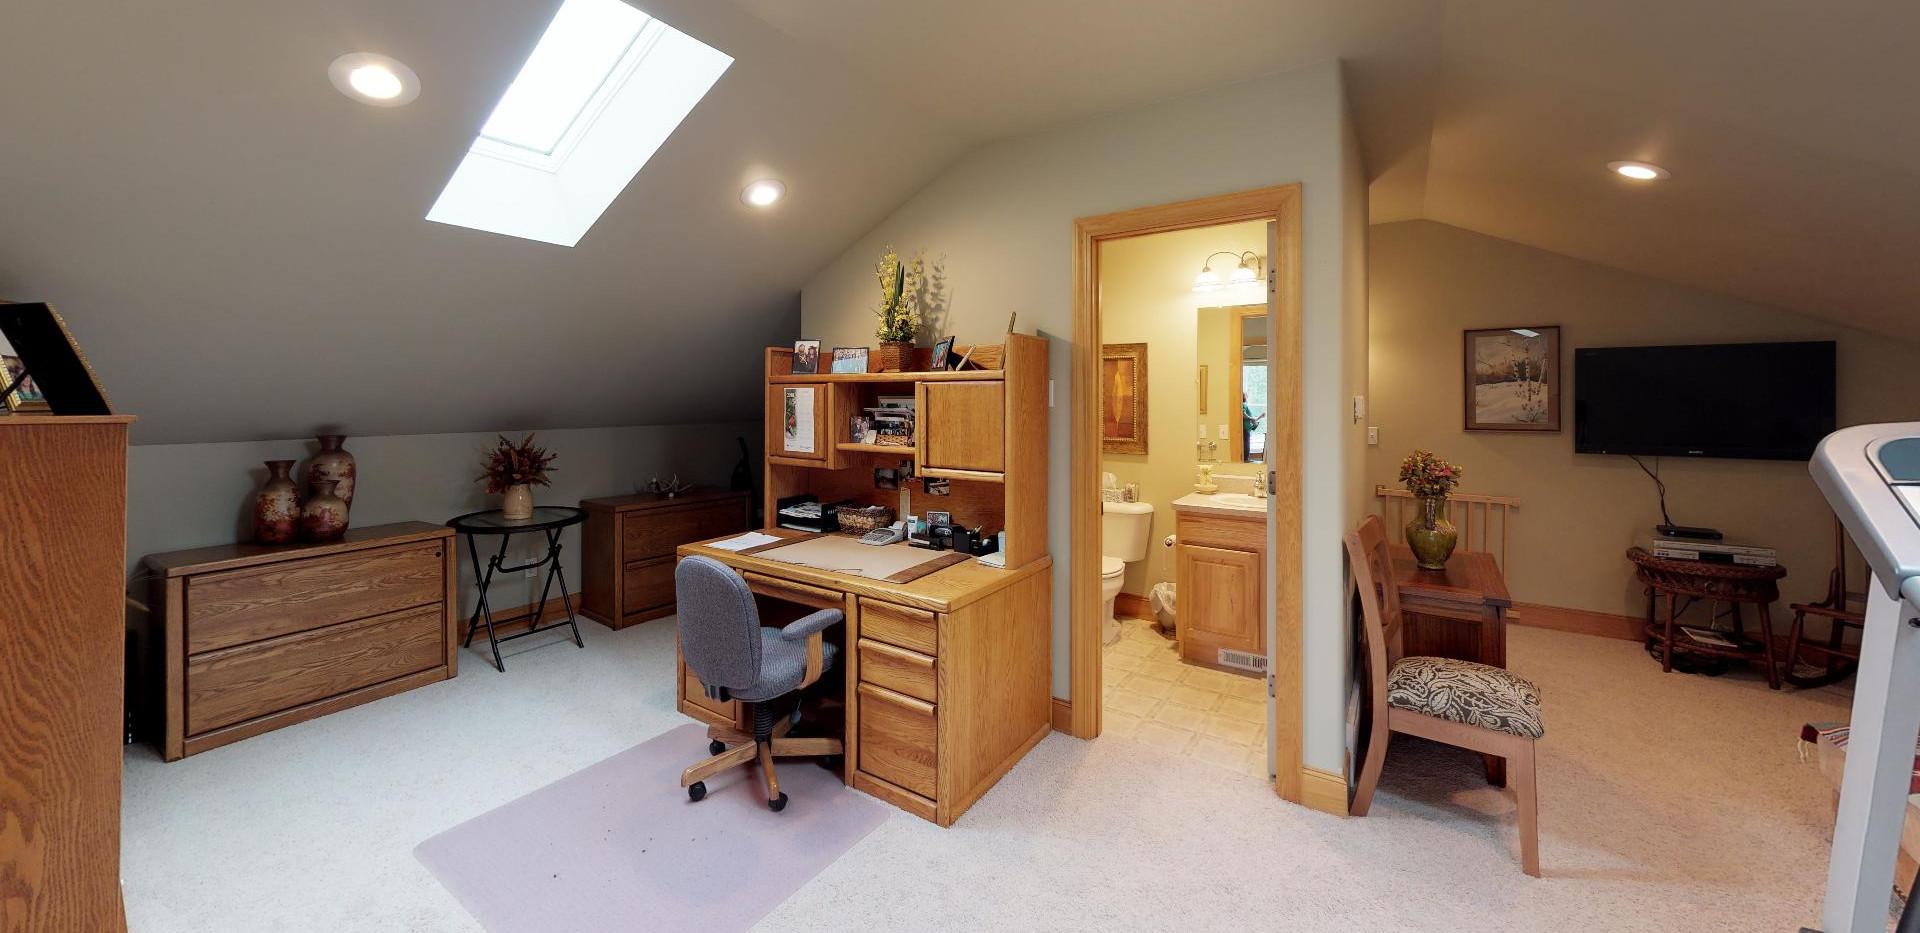 KFr8RyMwd2q - Bedroom.jpg